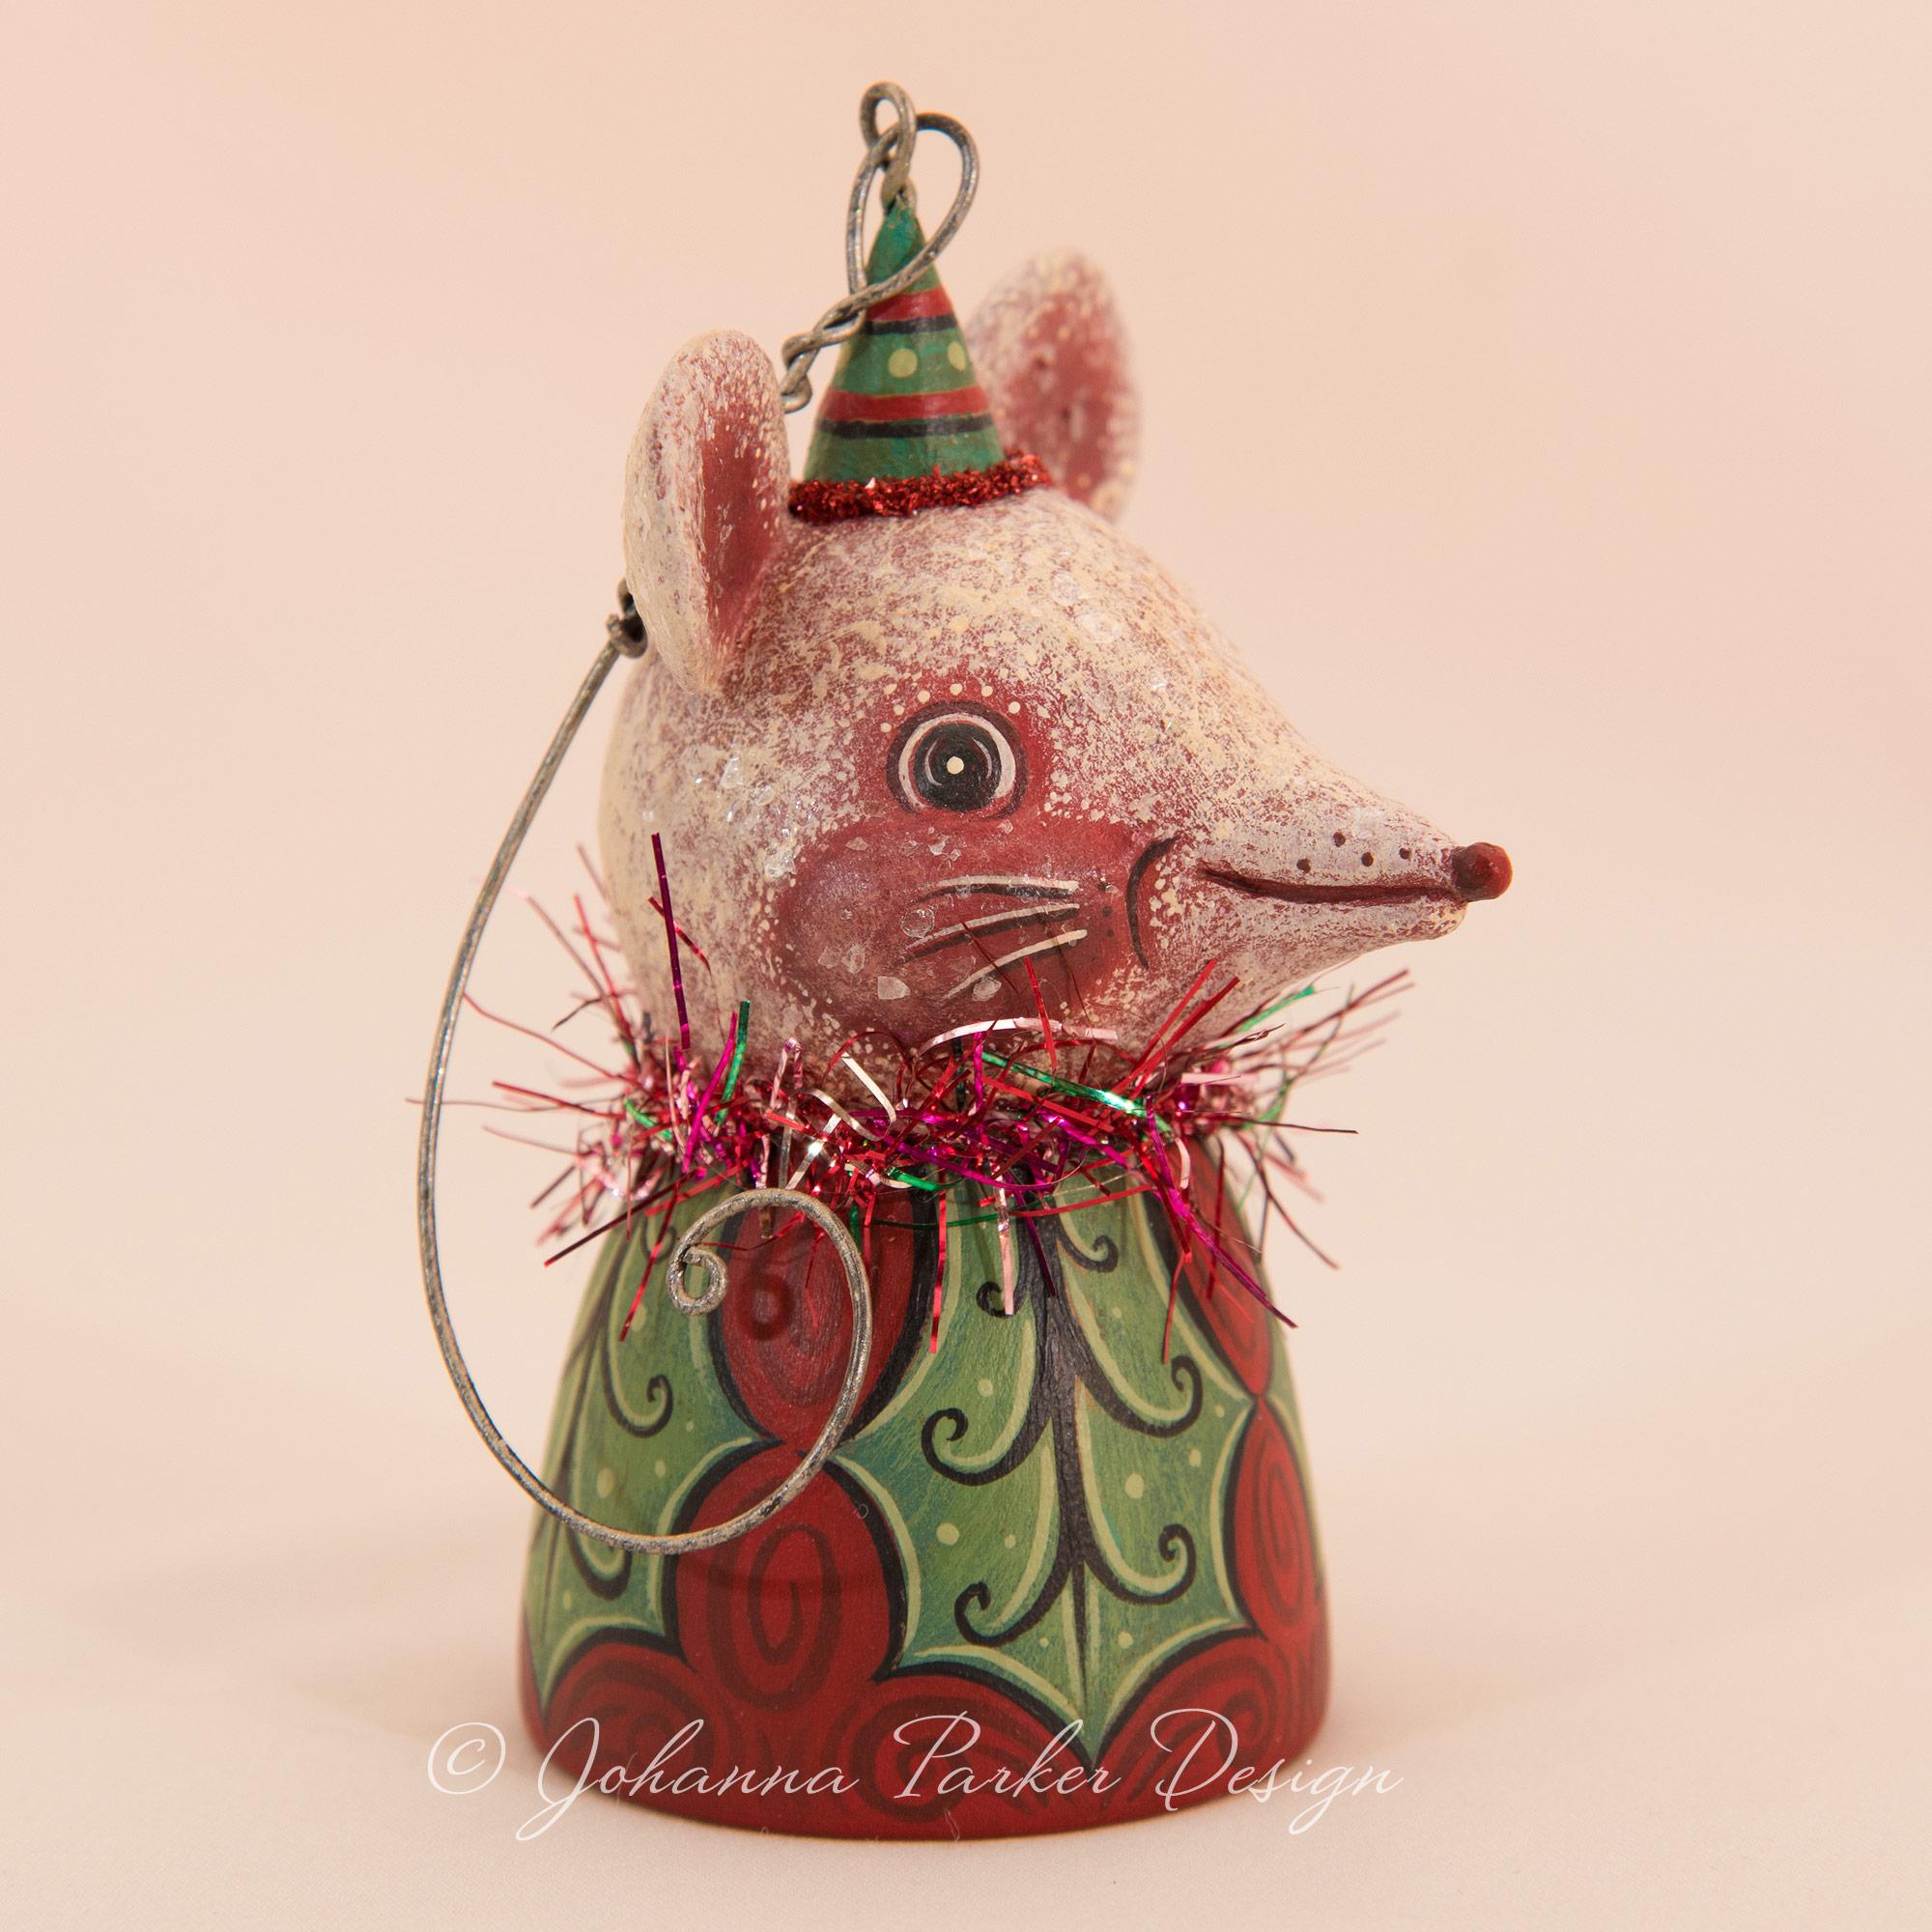 Johanna-Parker-Mouse-Ornament-Bell-3.jpg